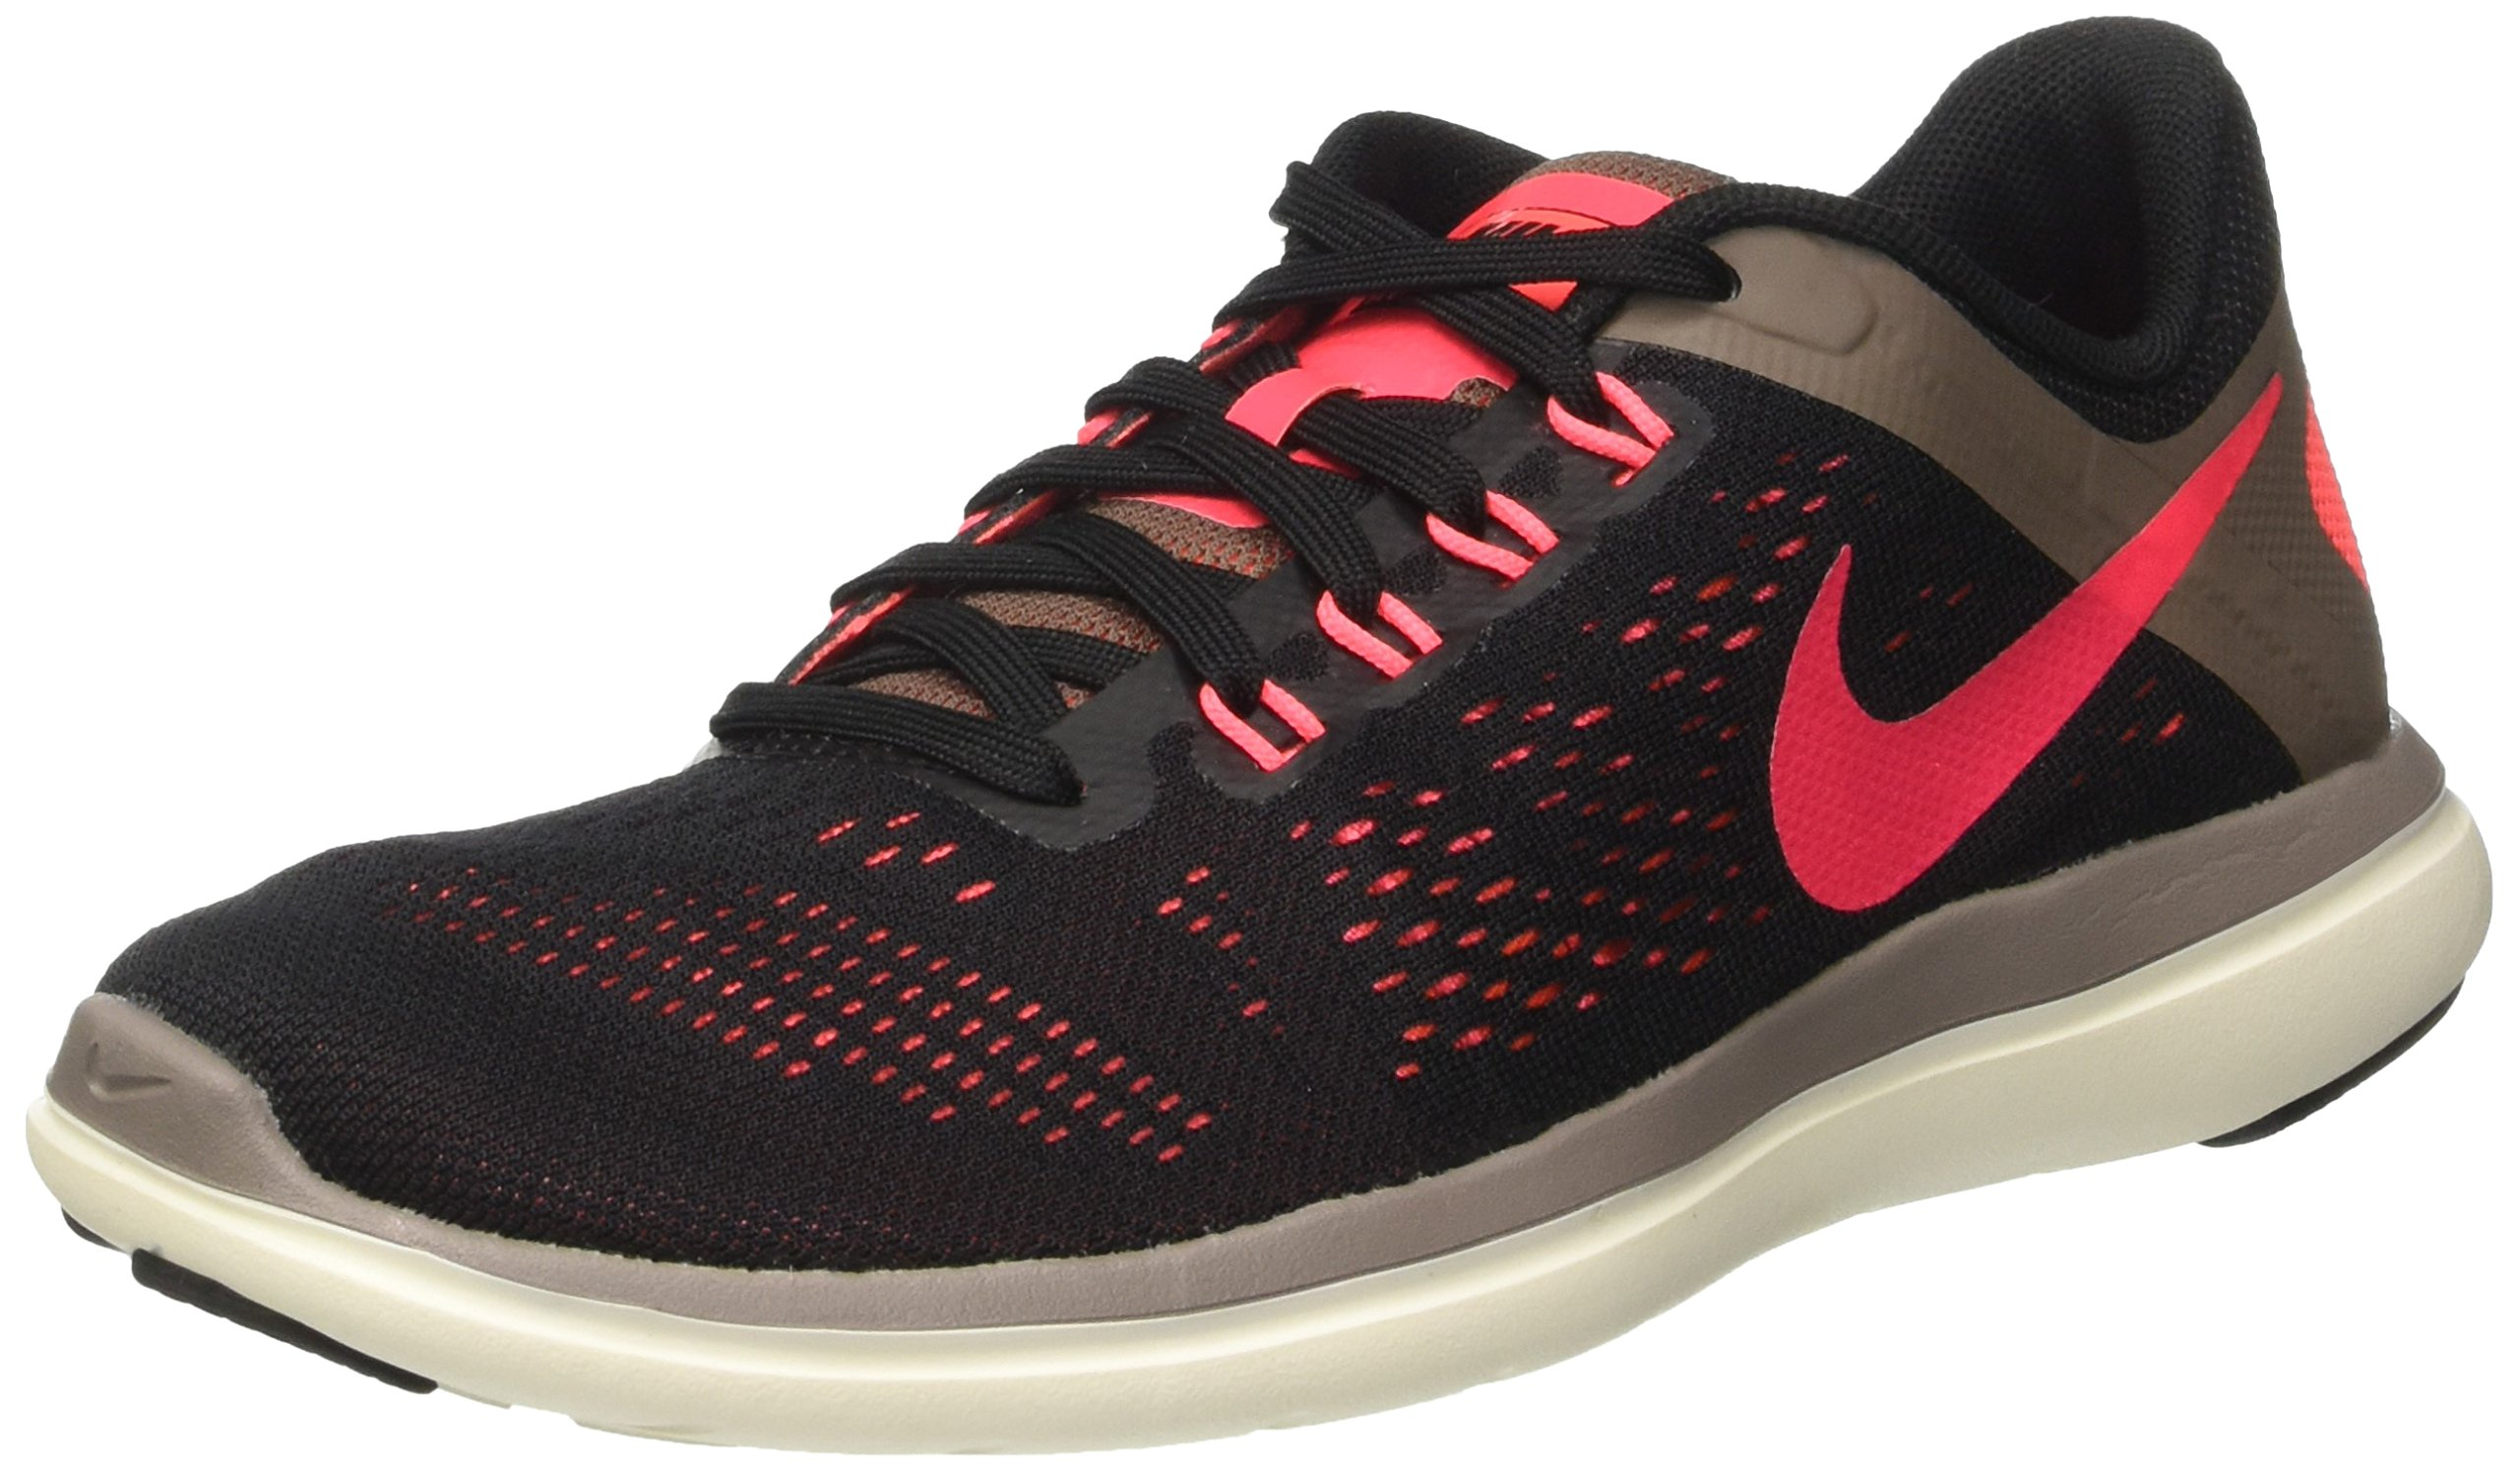 2e11182e4ce08 Galleon - Nike Women s Flex 2016 RN Running Shoes Black Hot Punch Dark  Mushroom Sail 7.5 B(M) US